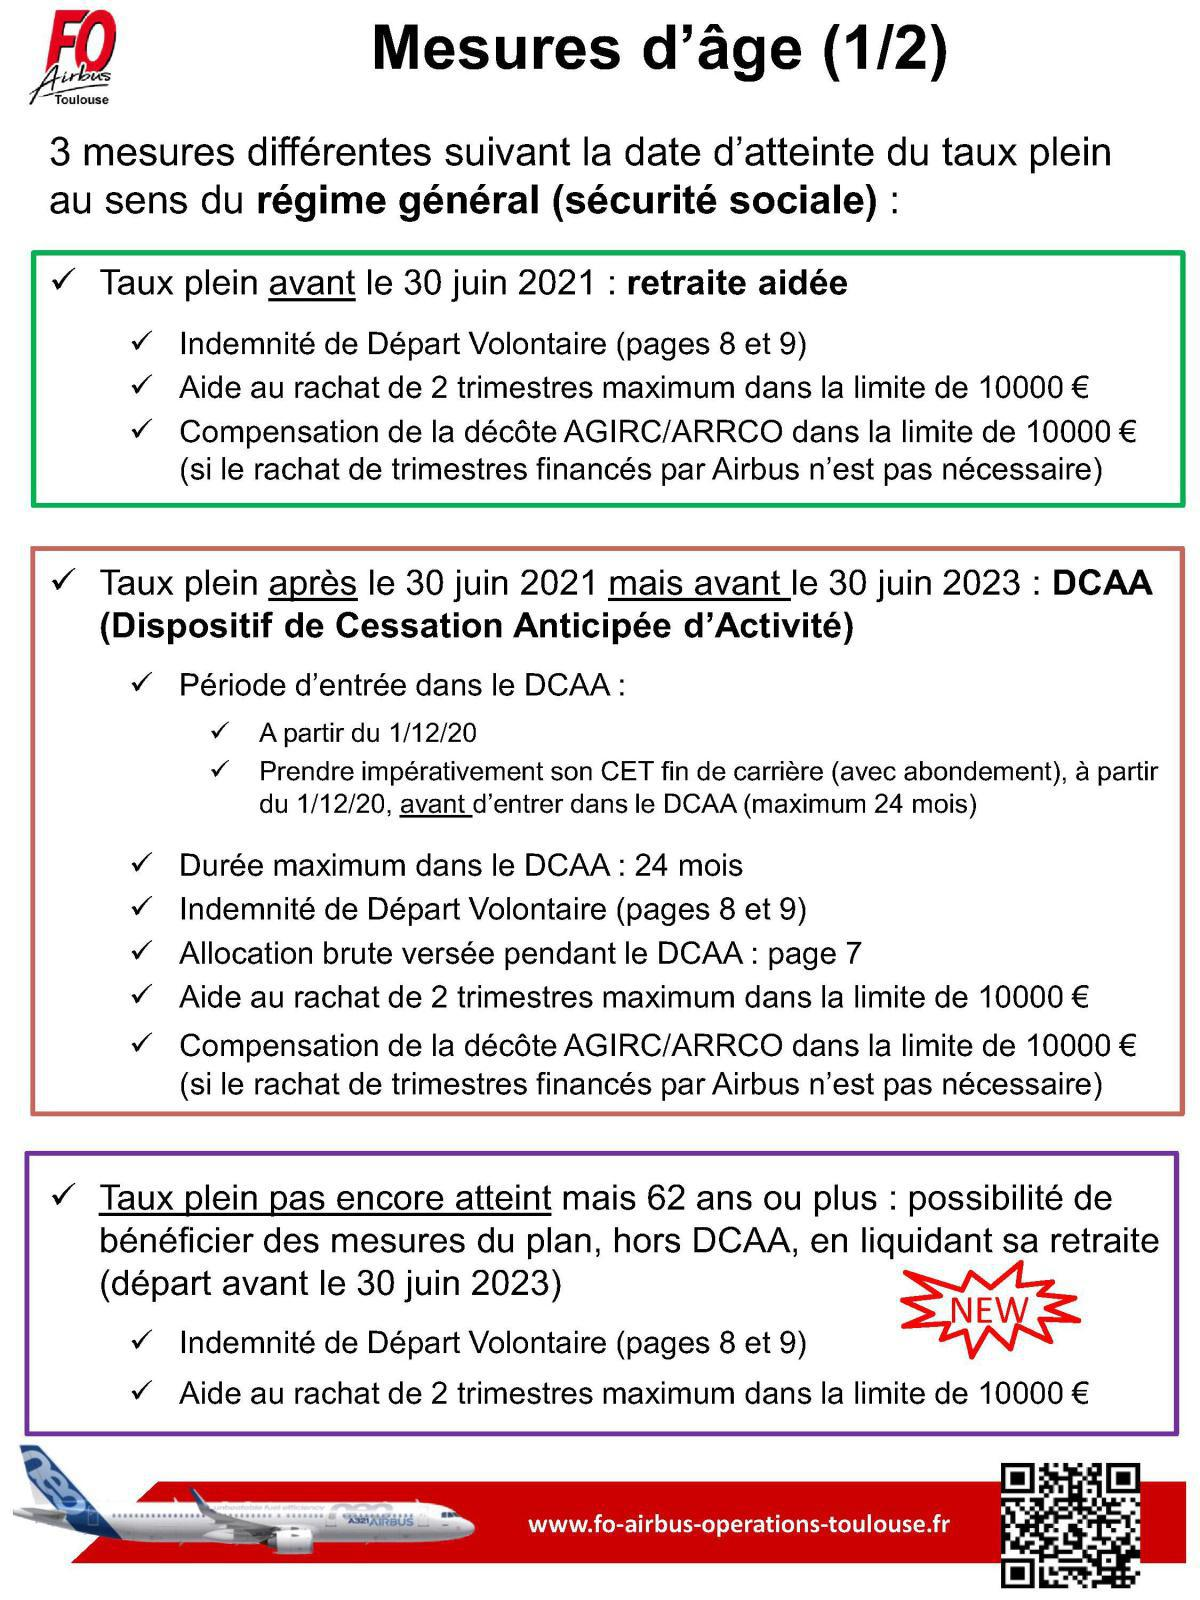 CSE-C extraordinaire du 29/07/2020